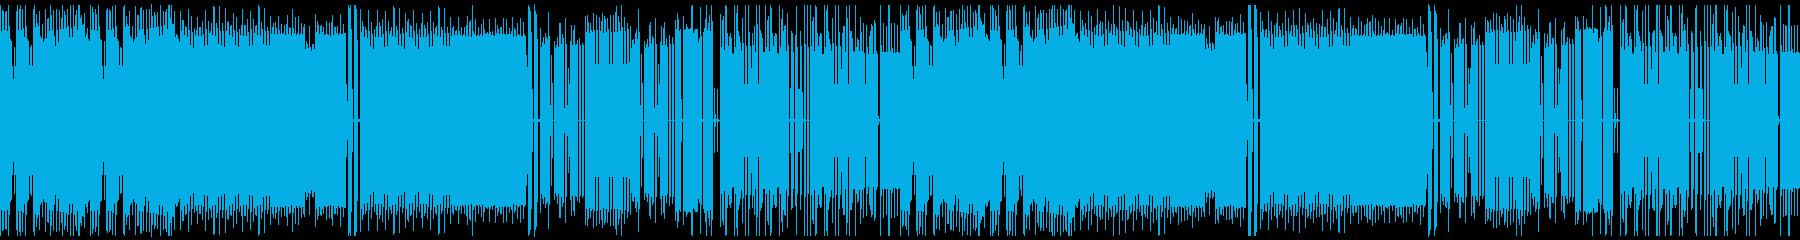 FC風ループ 海底基地の再生済みの波形